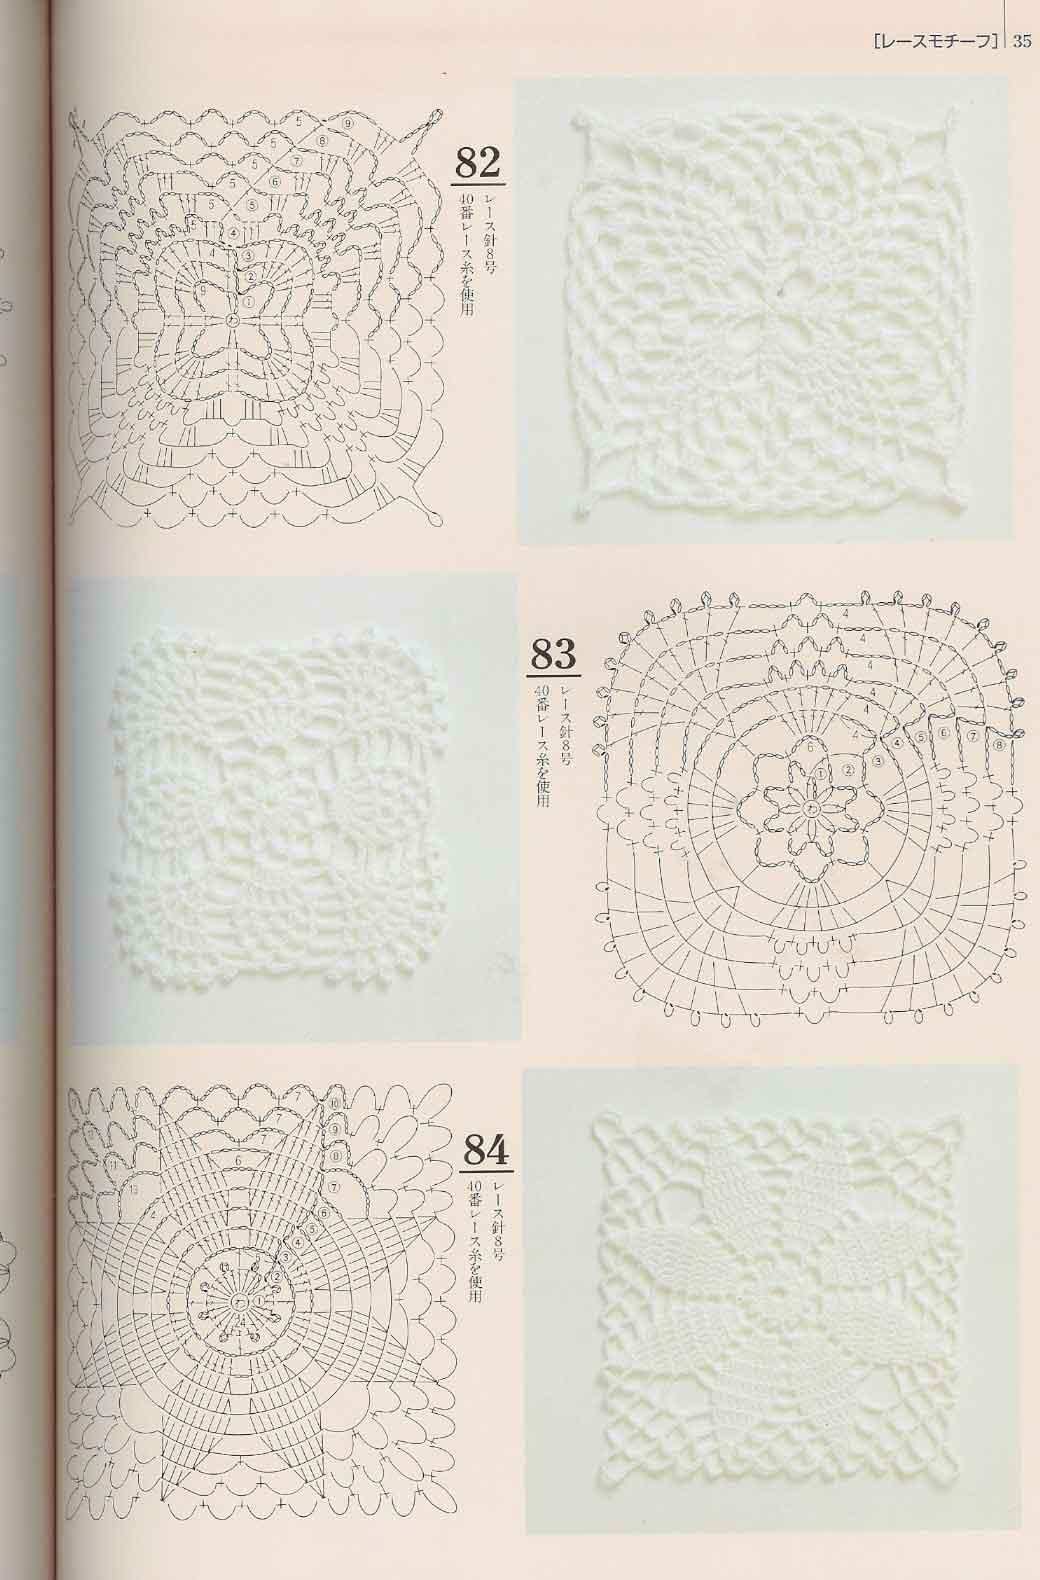 Piastrelle uncinetto 23 punto croce uncinetto schemi gratis hobby creativi - Schemi piastrelle uncinetto ...